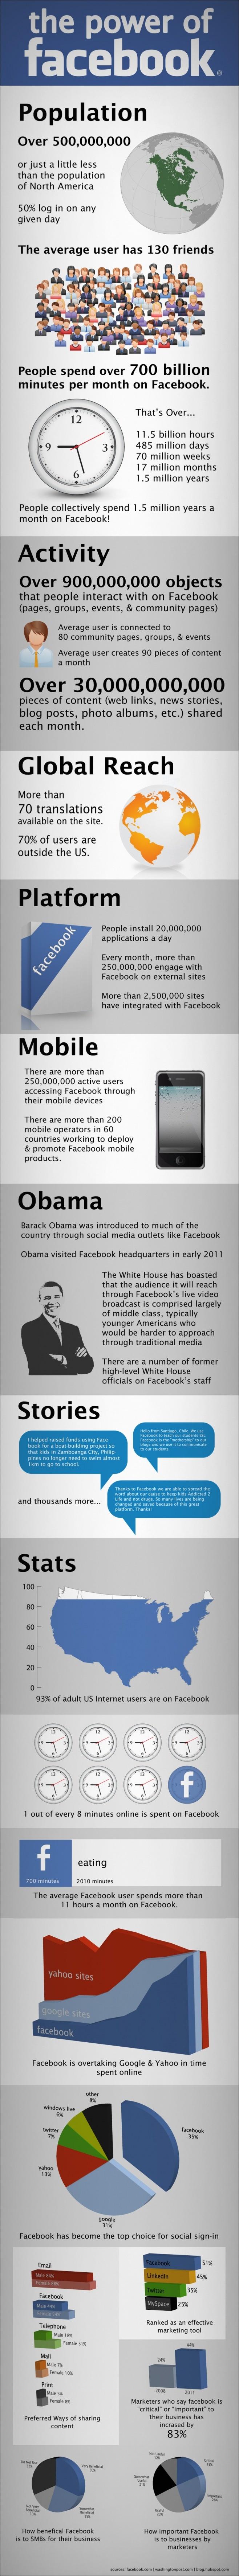 El poder de Facebook